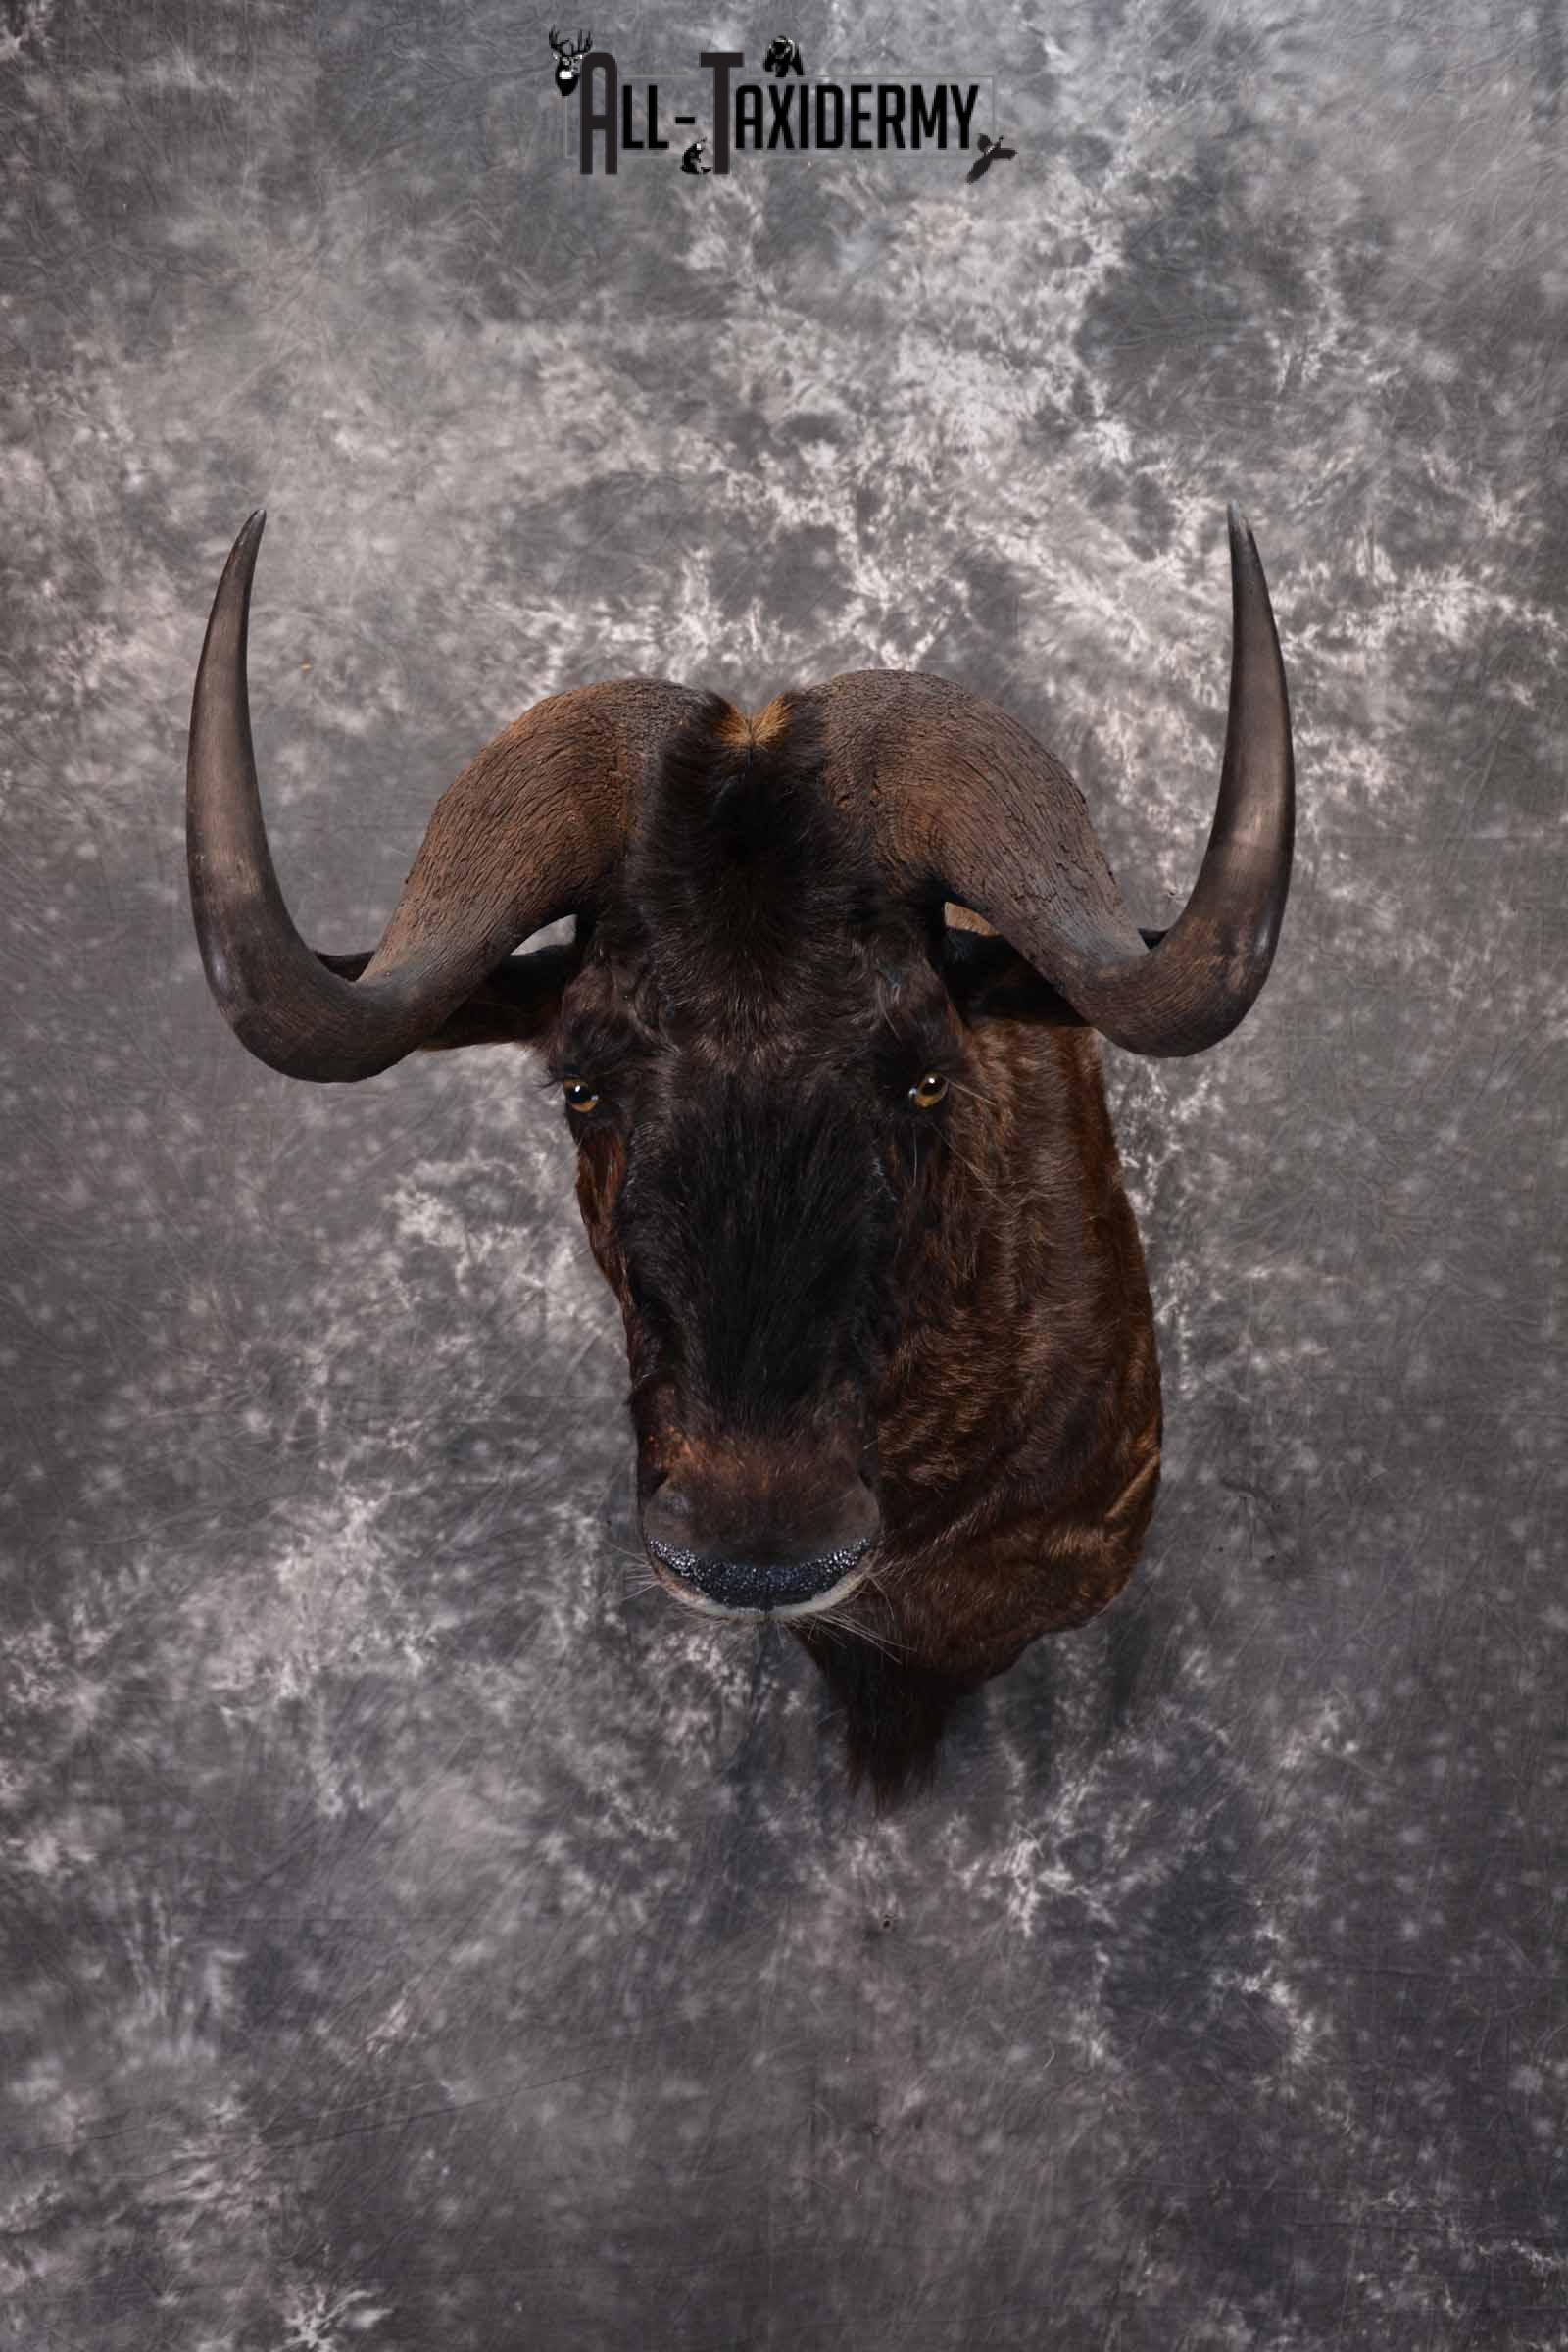 African Black Wildebeest taxidermy shoulder mount for sale SKU 1374